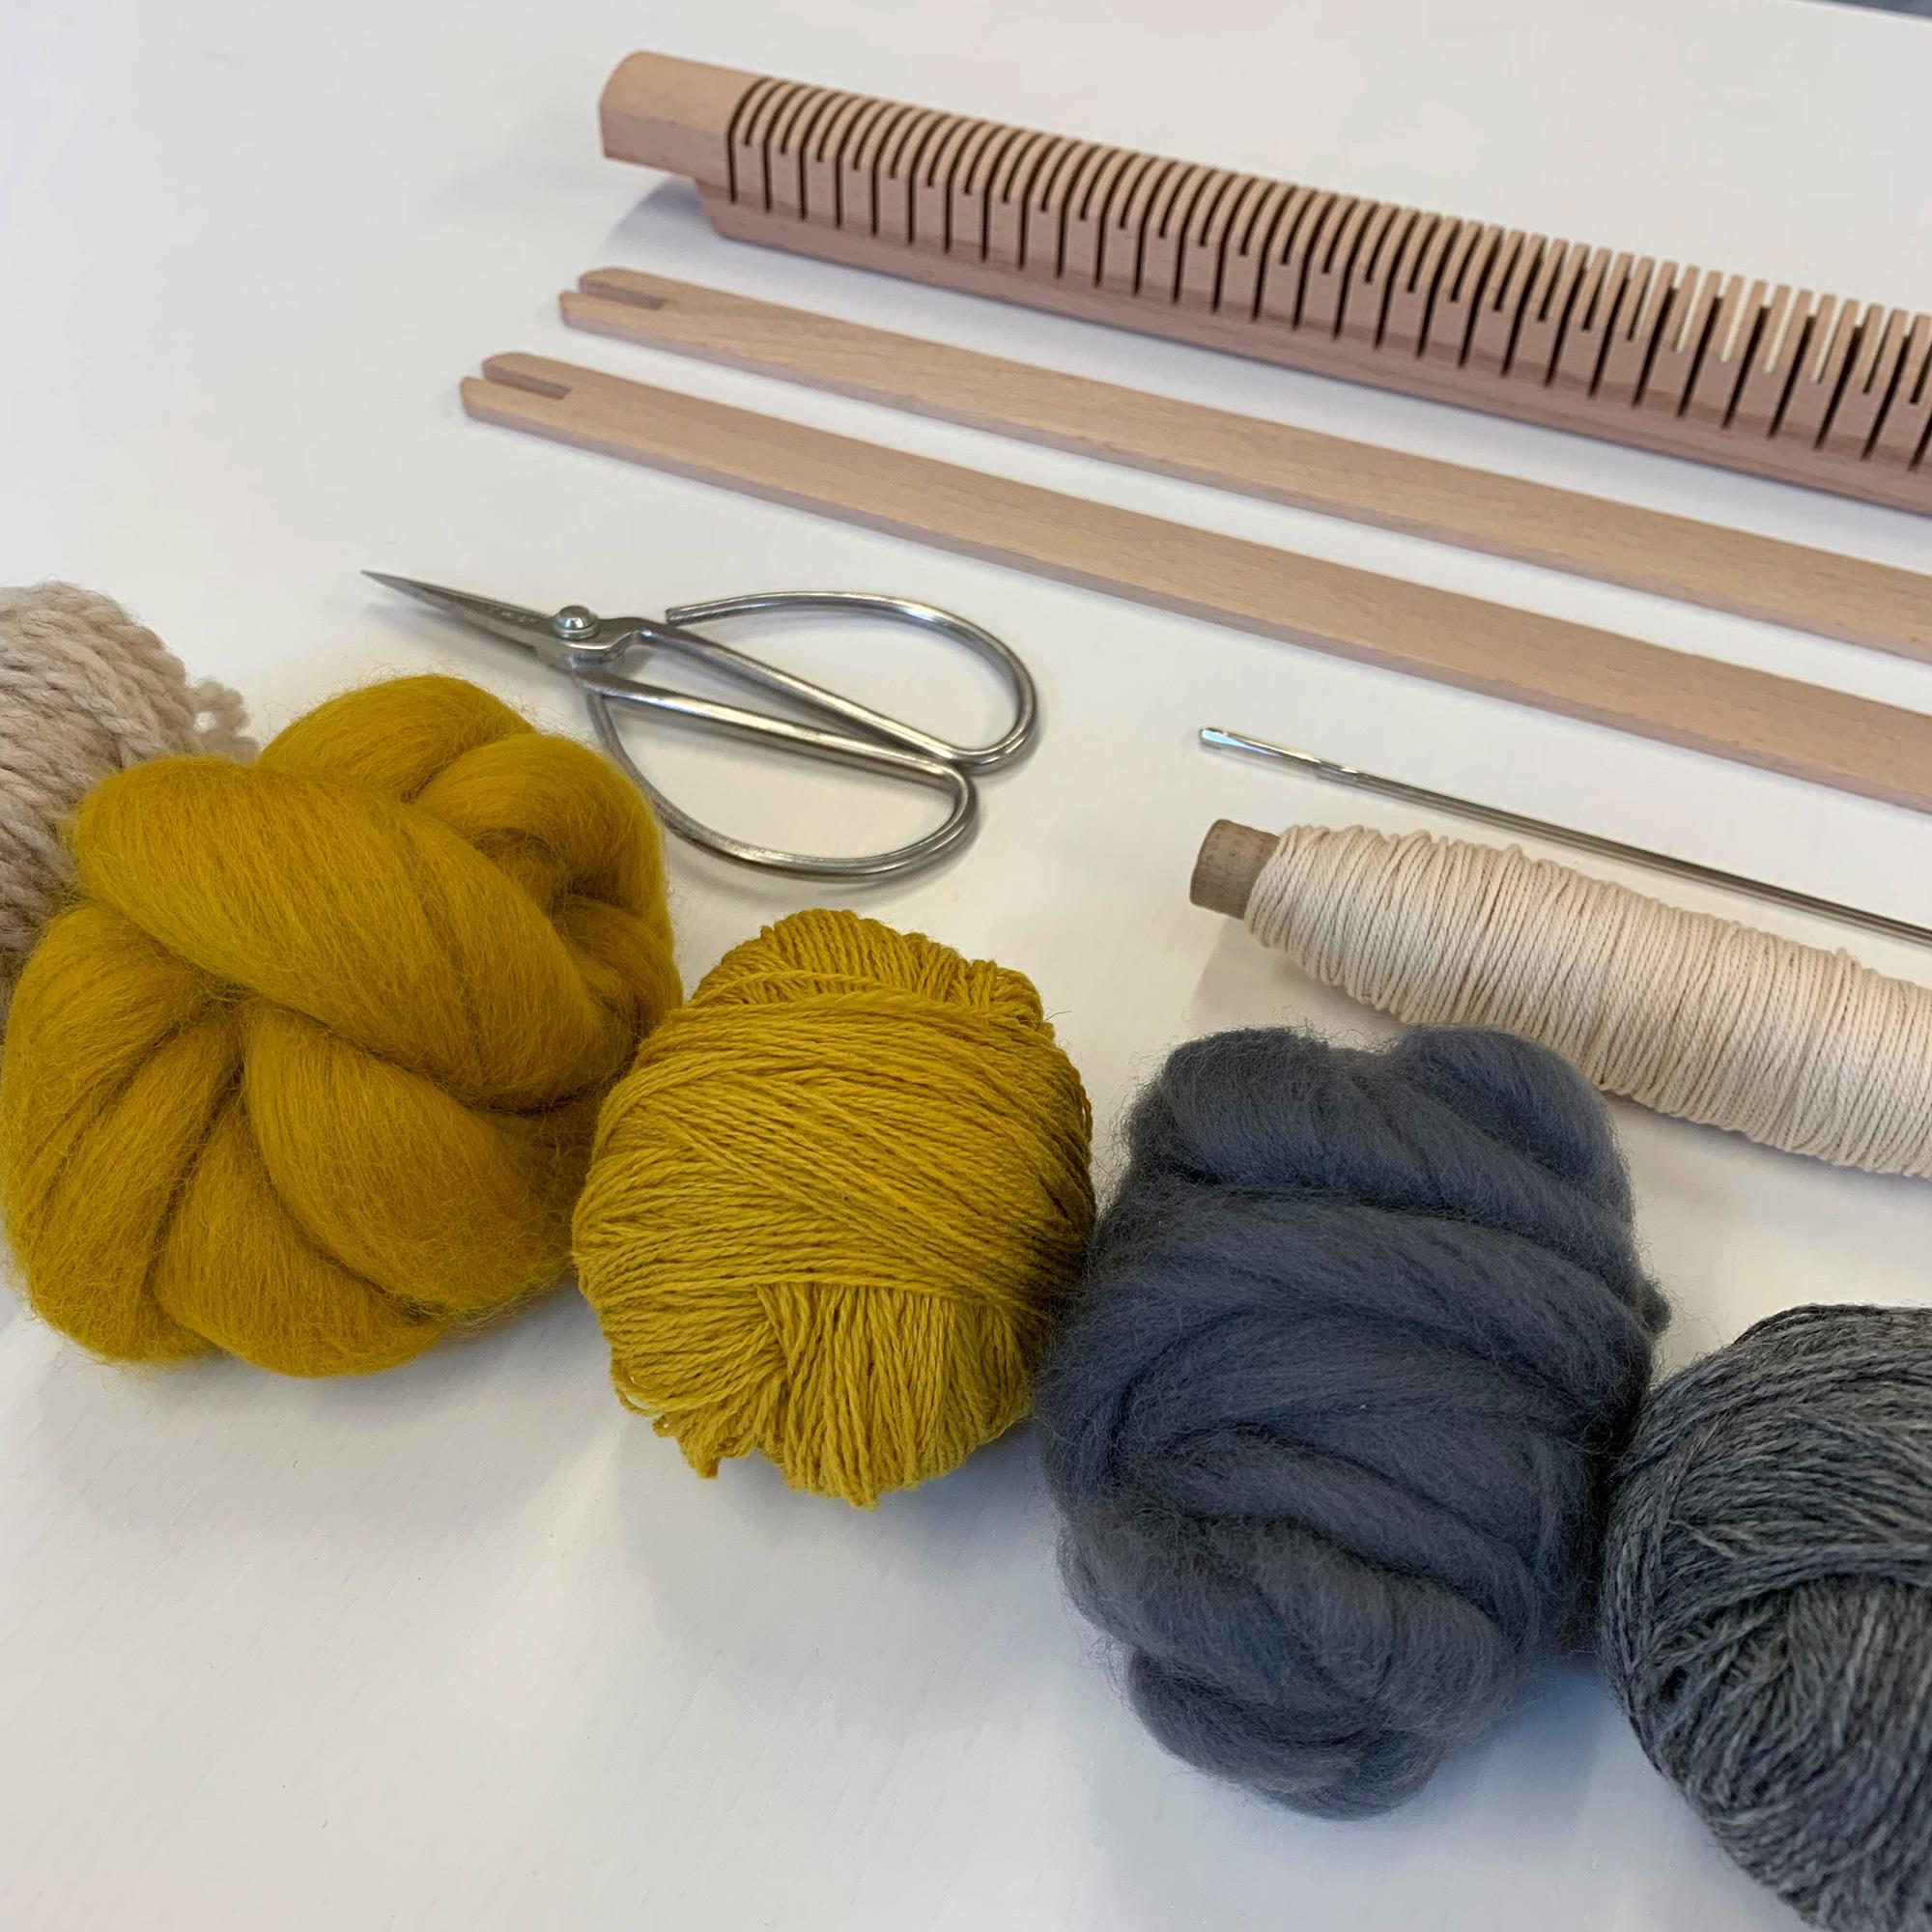 Pamela Print Weaving Loom Kit with Mustard yellow + Grey Yarn Pack